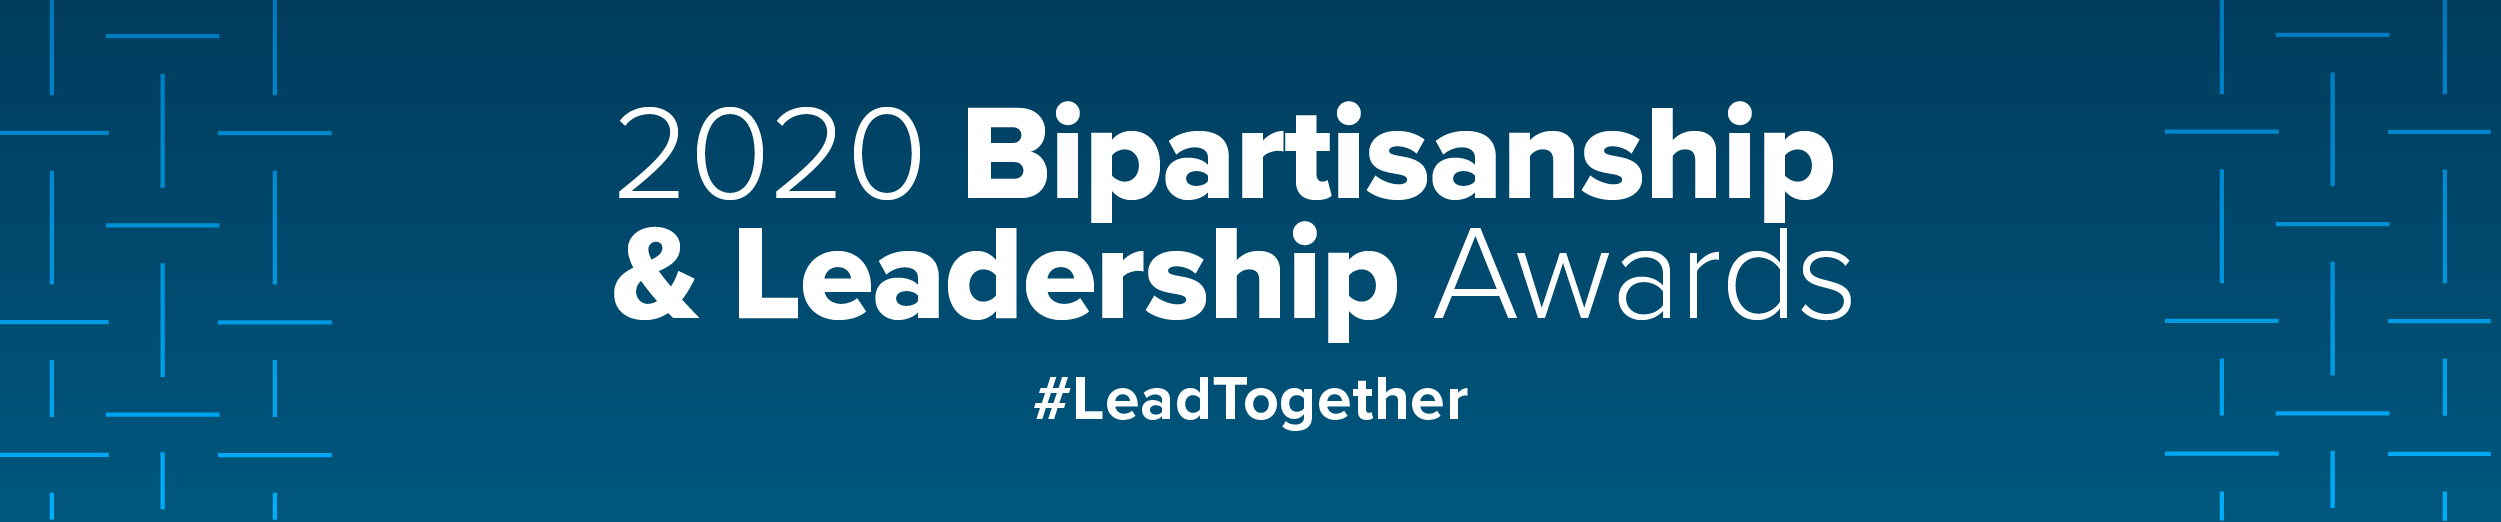 #LeadTogether ARC Banner